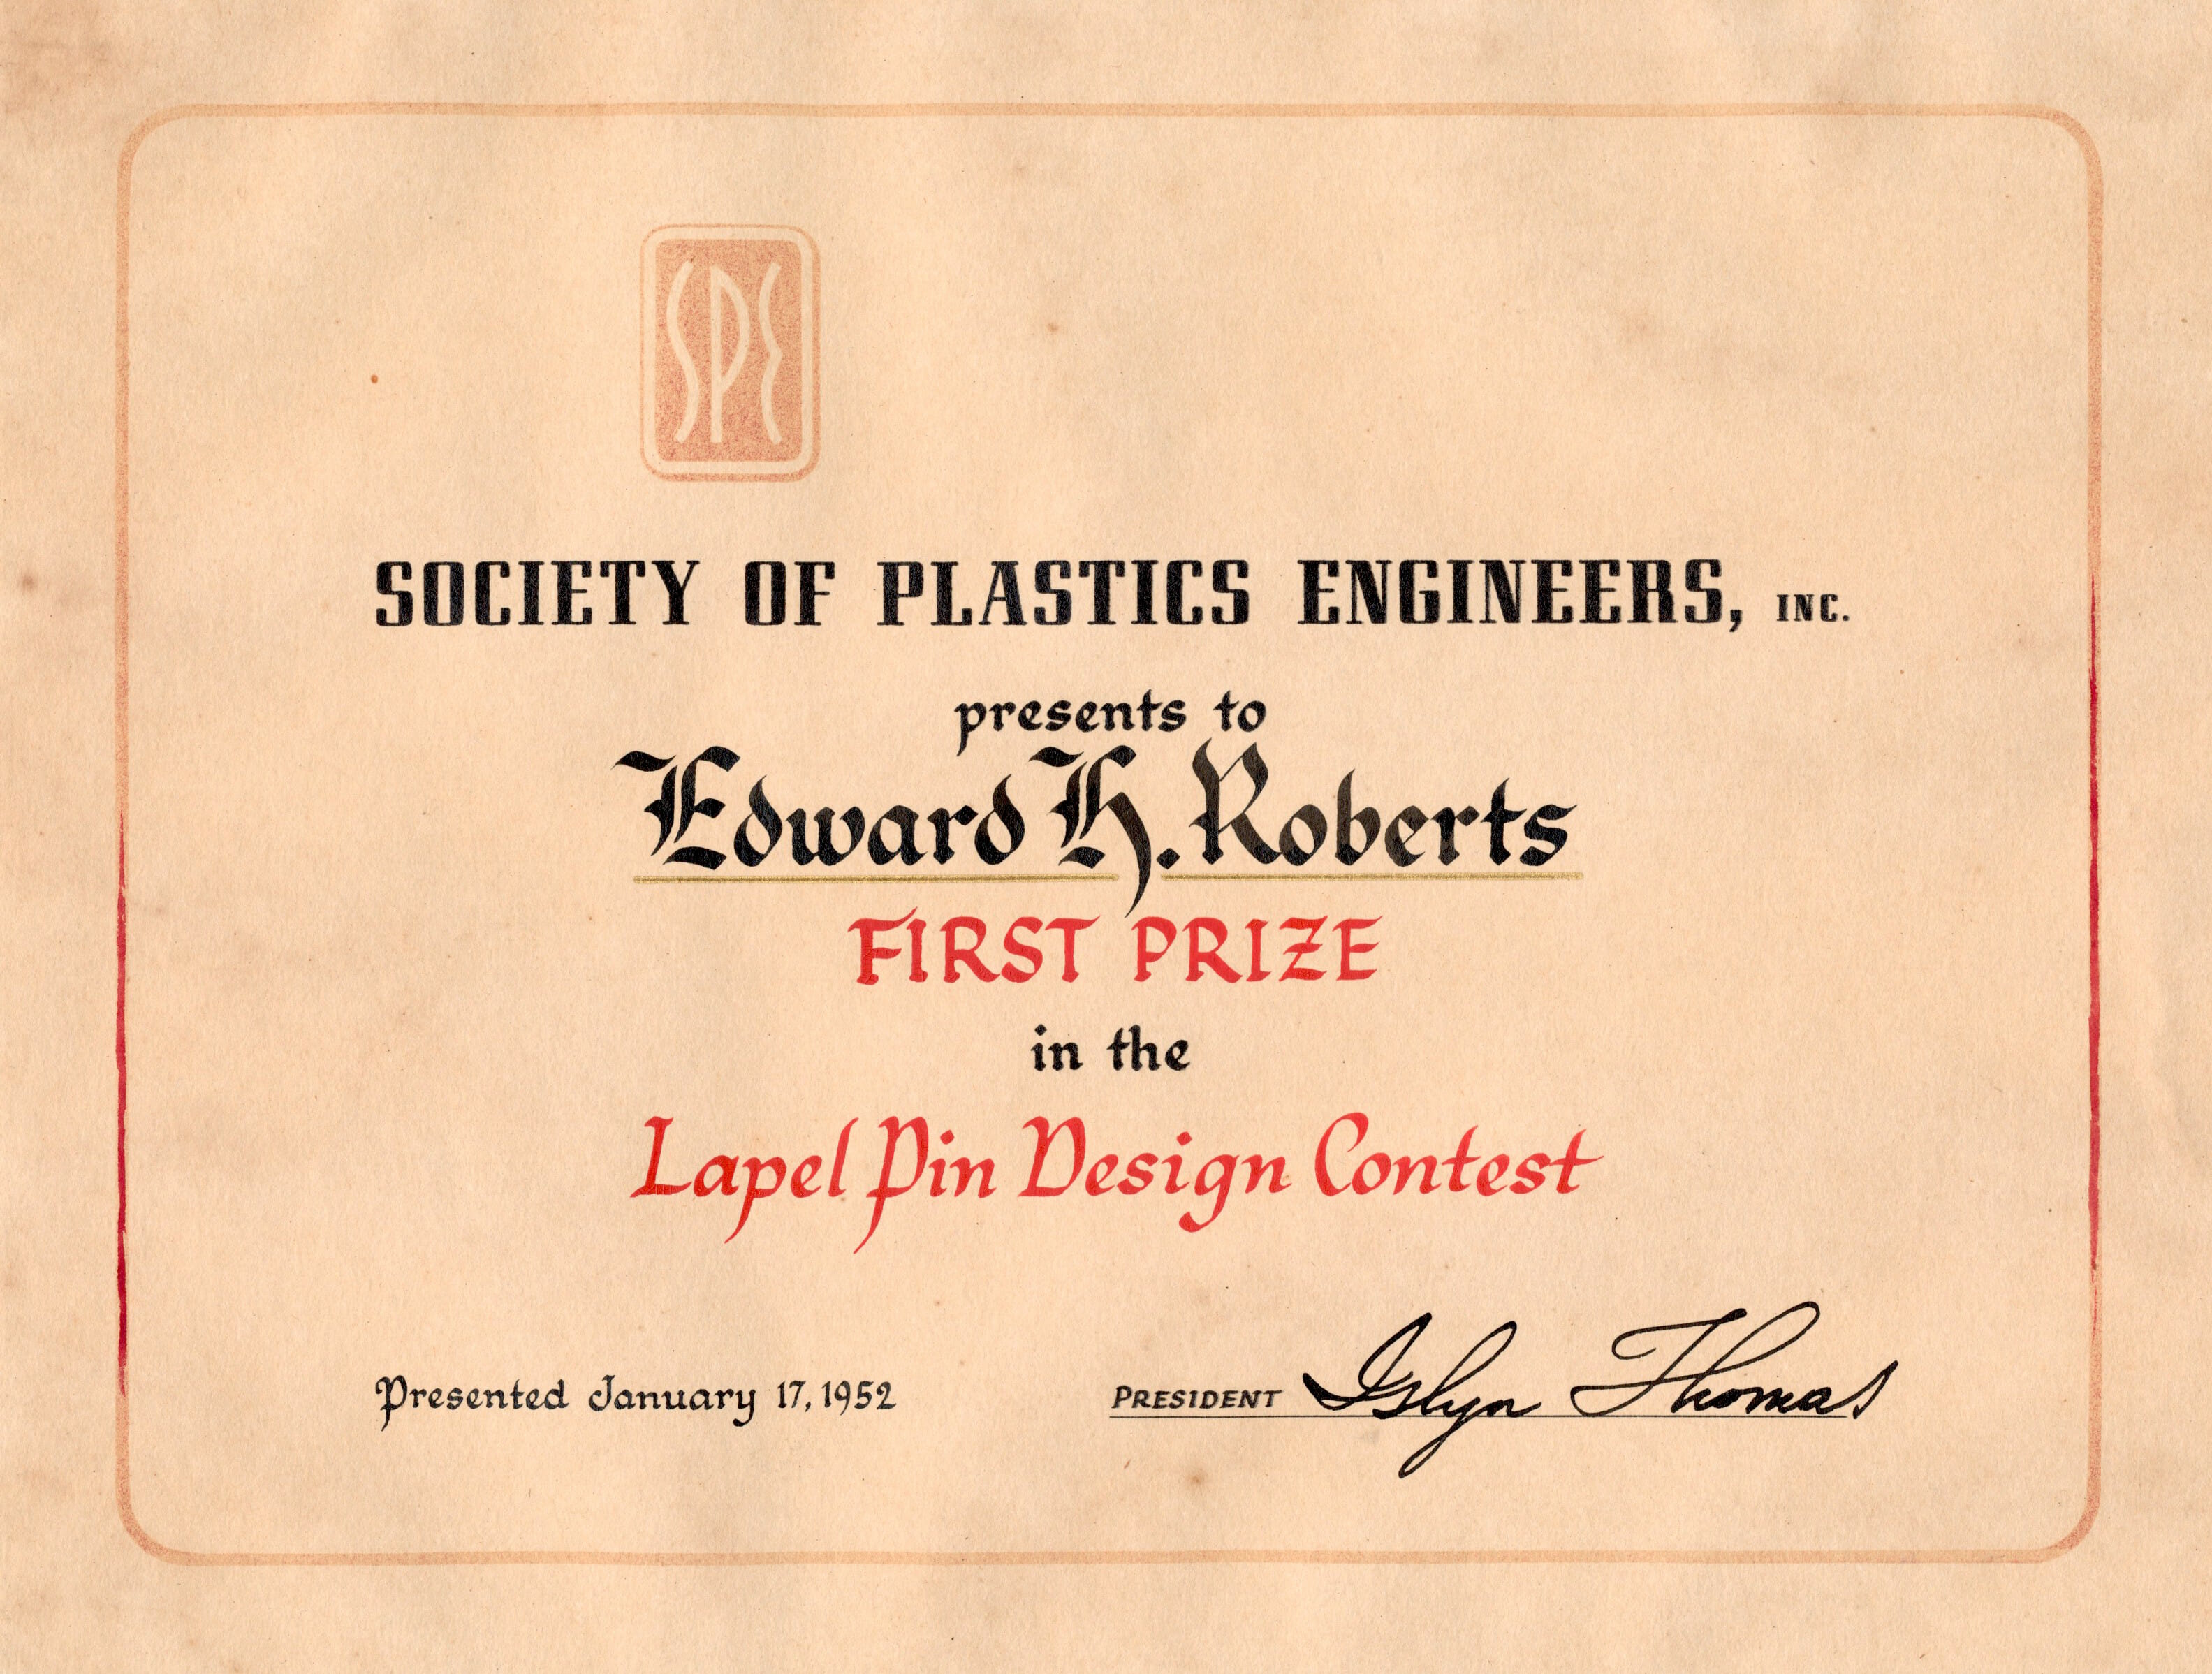 Society of Plastics Engineers 1942-1952 SPE history batch